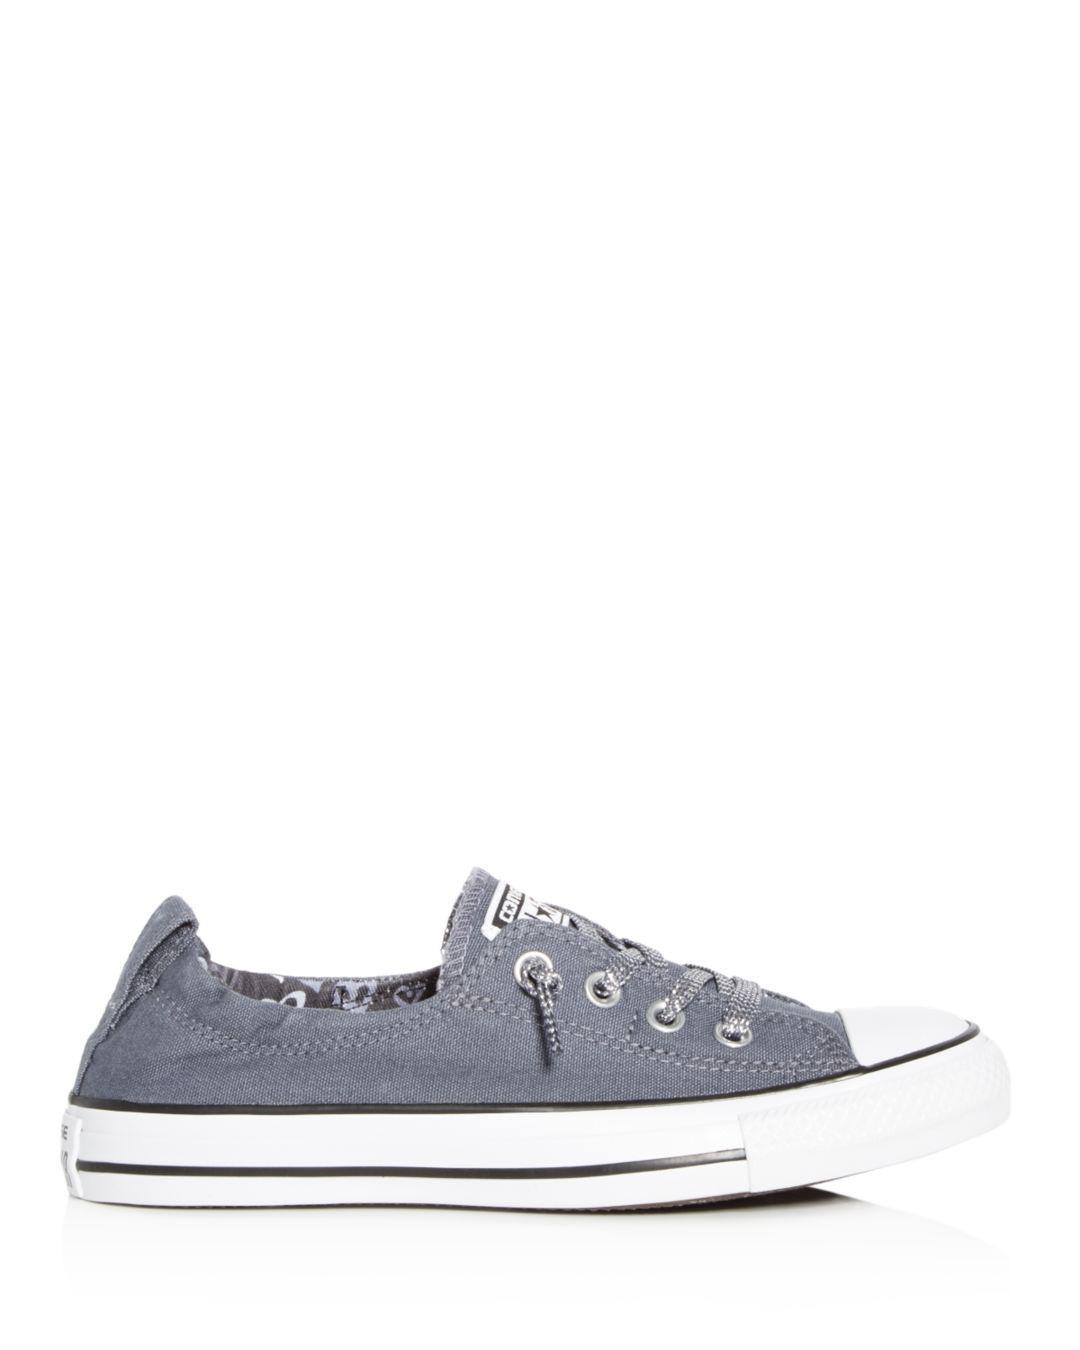 6e90a59644cb ... cheap converse womens chuck taylor all star shoreline slip on sneakers  in blue lyst ddf80 9514f